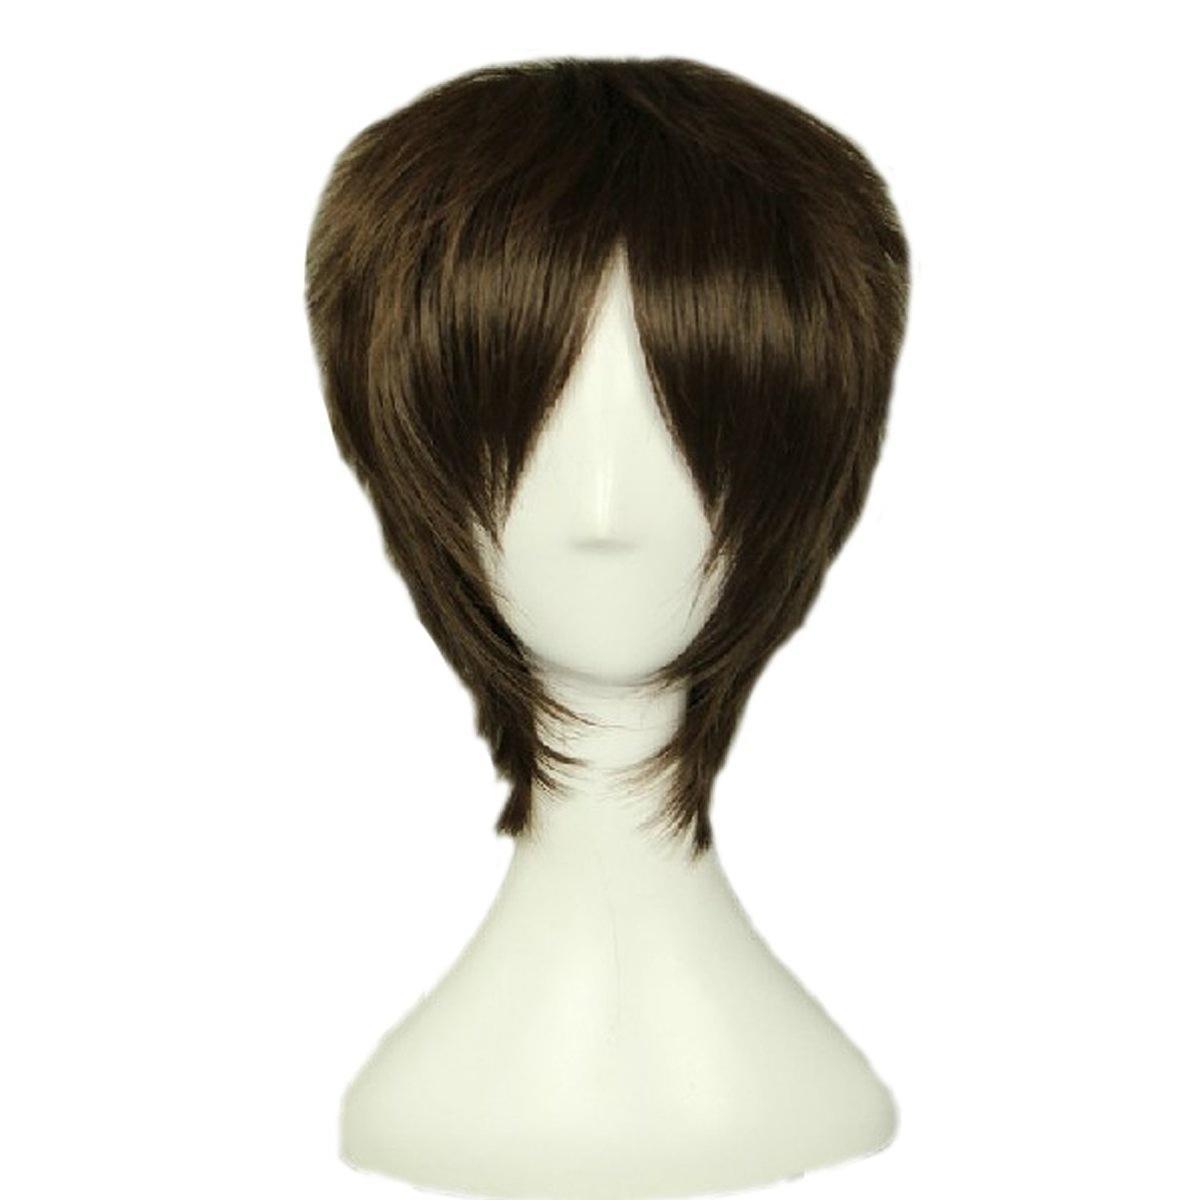 Mens Layered Natural Looking Cosplay Daily Hair Full Wigs Short Brown